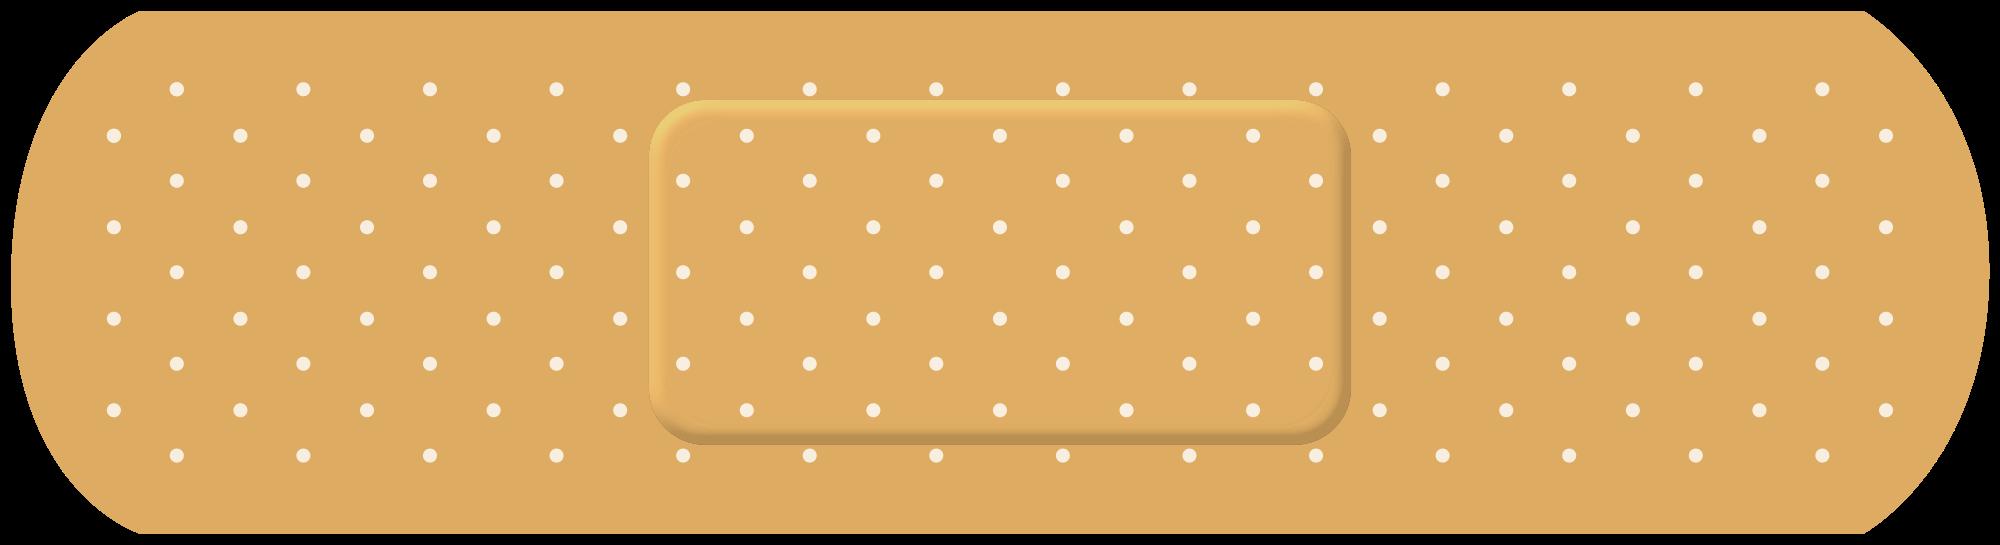 Bandaid band aid clip art image